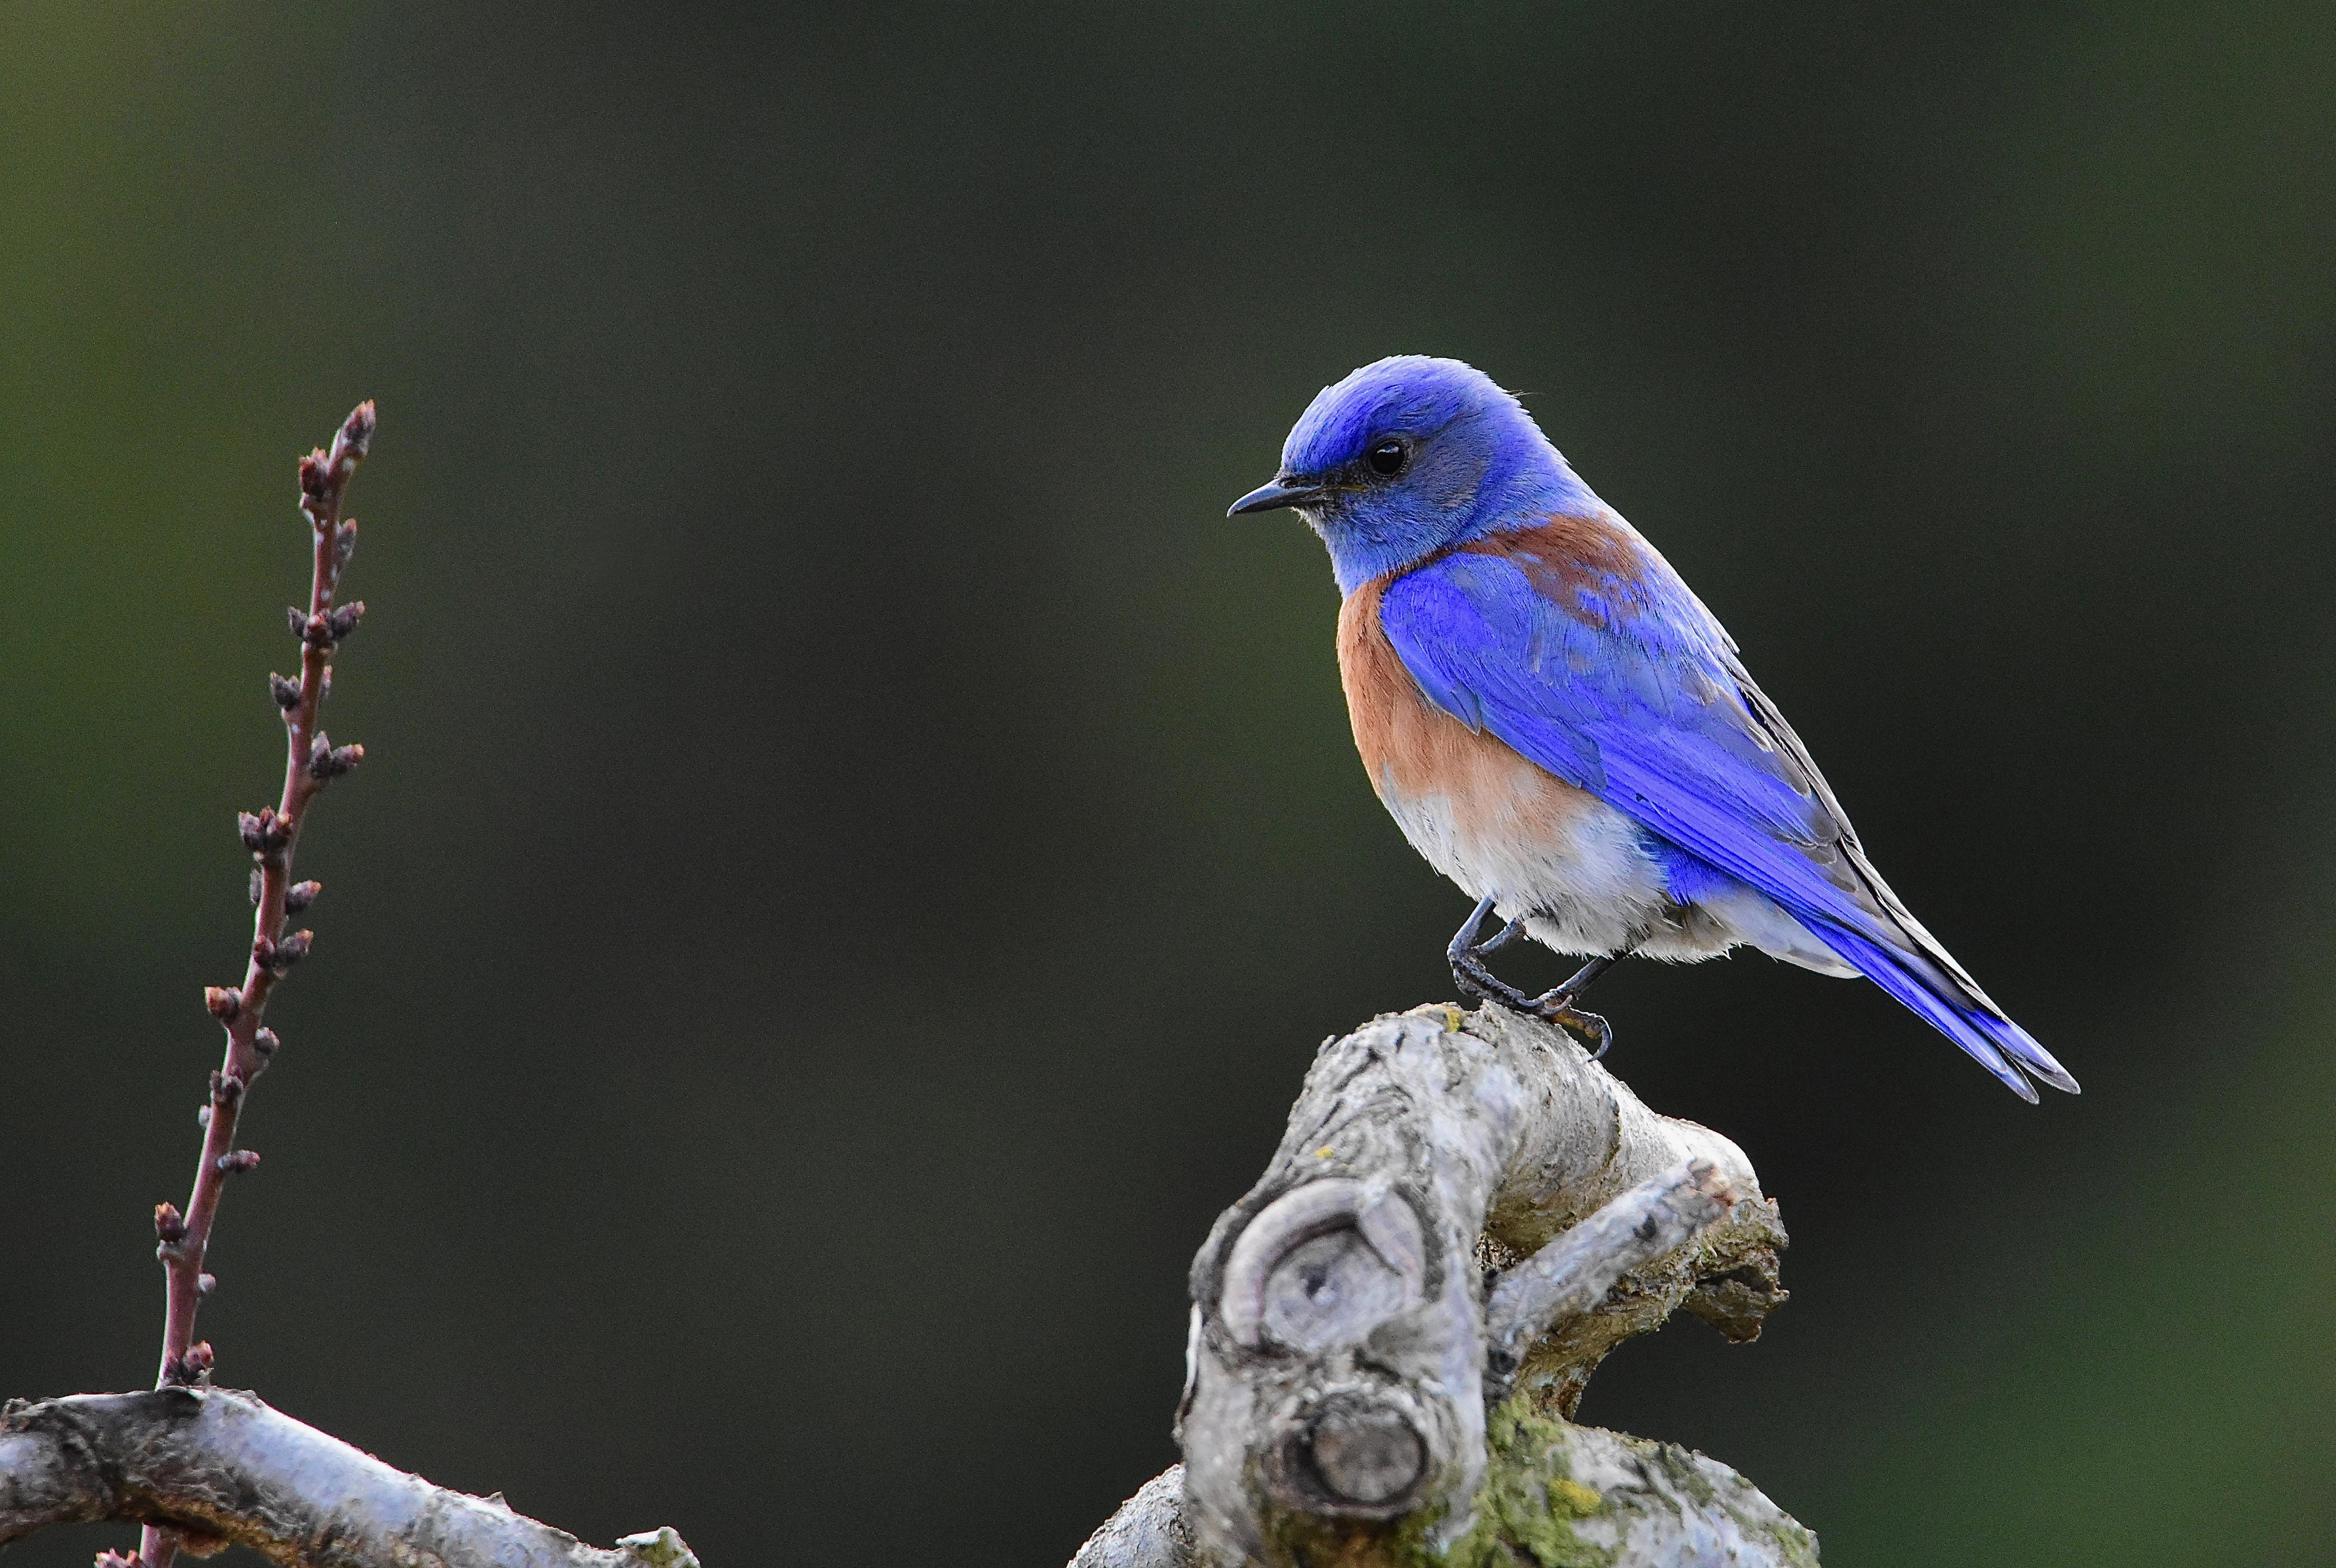 Western Bluebird at Heritage Orchard, Sunnyvale, CA